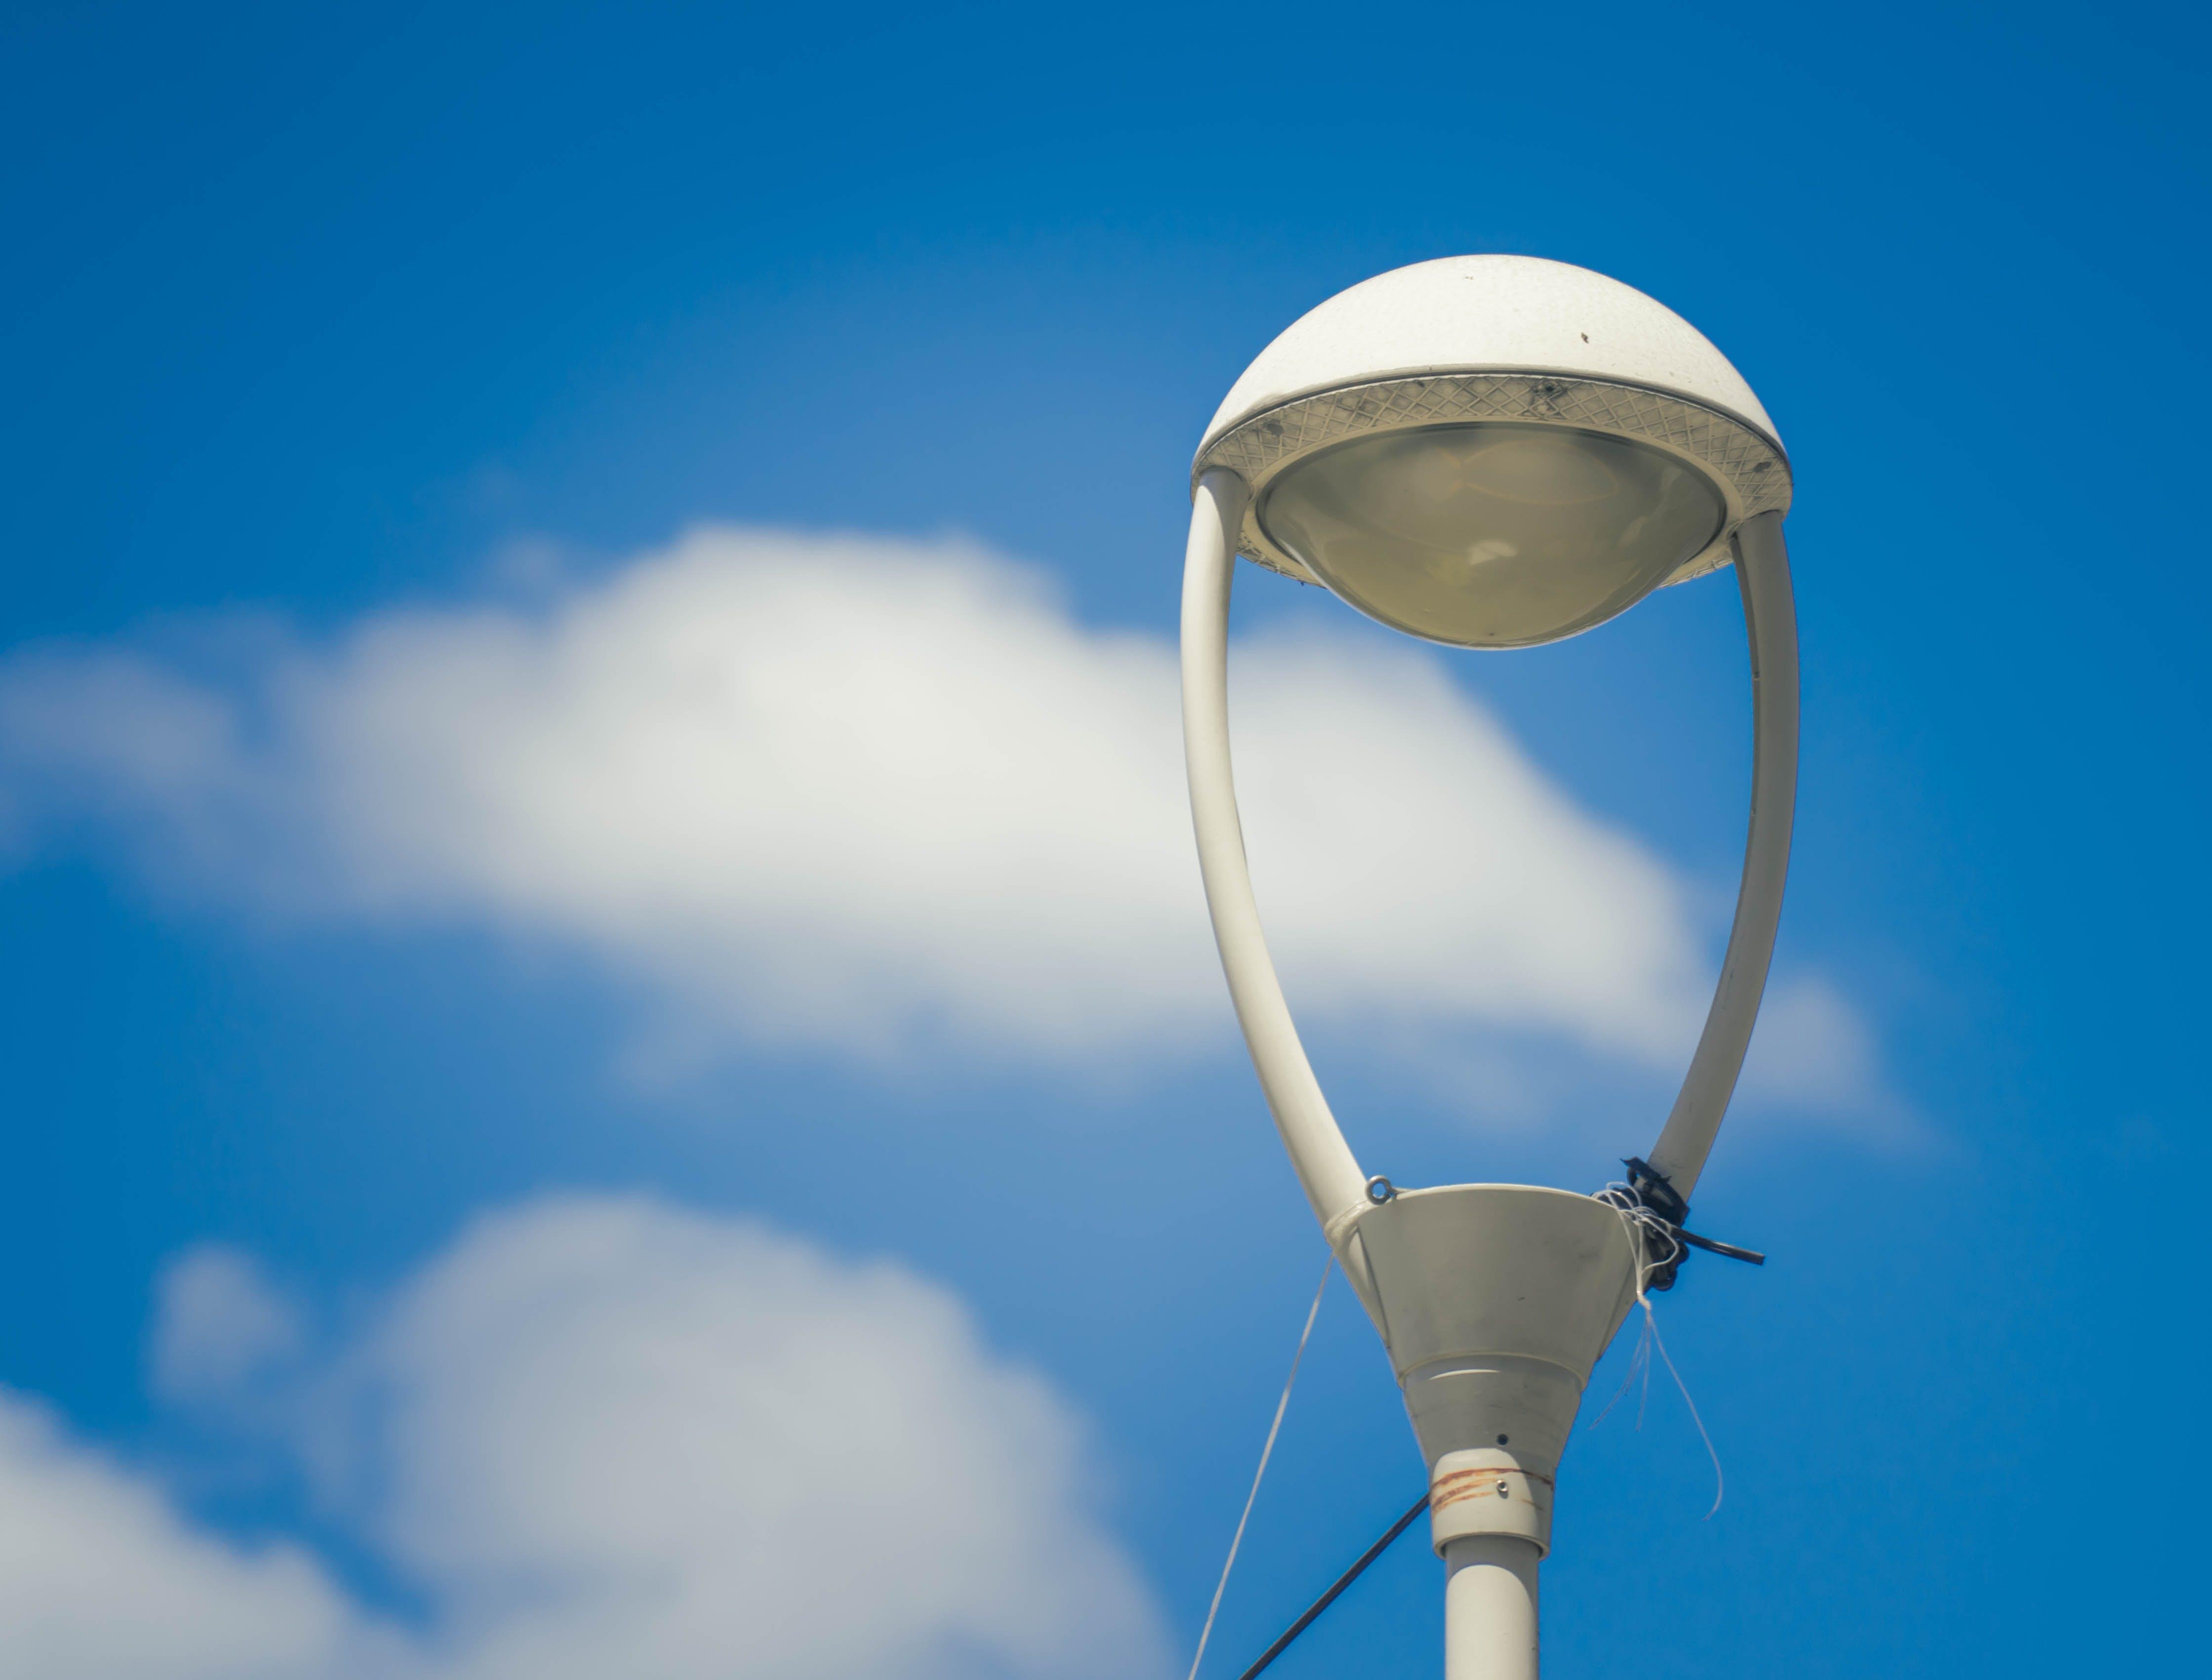 Kostenloses Stock Foto zu blauer himmel, frieden, himmel, klarer himmel